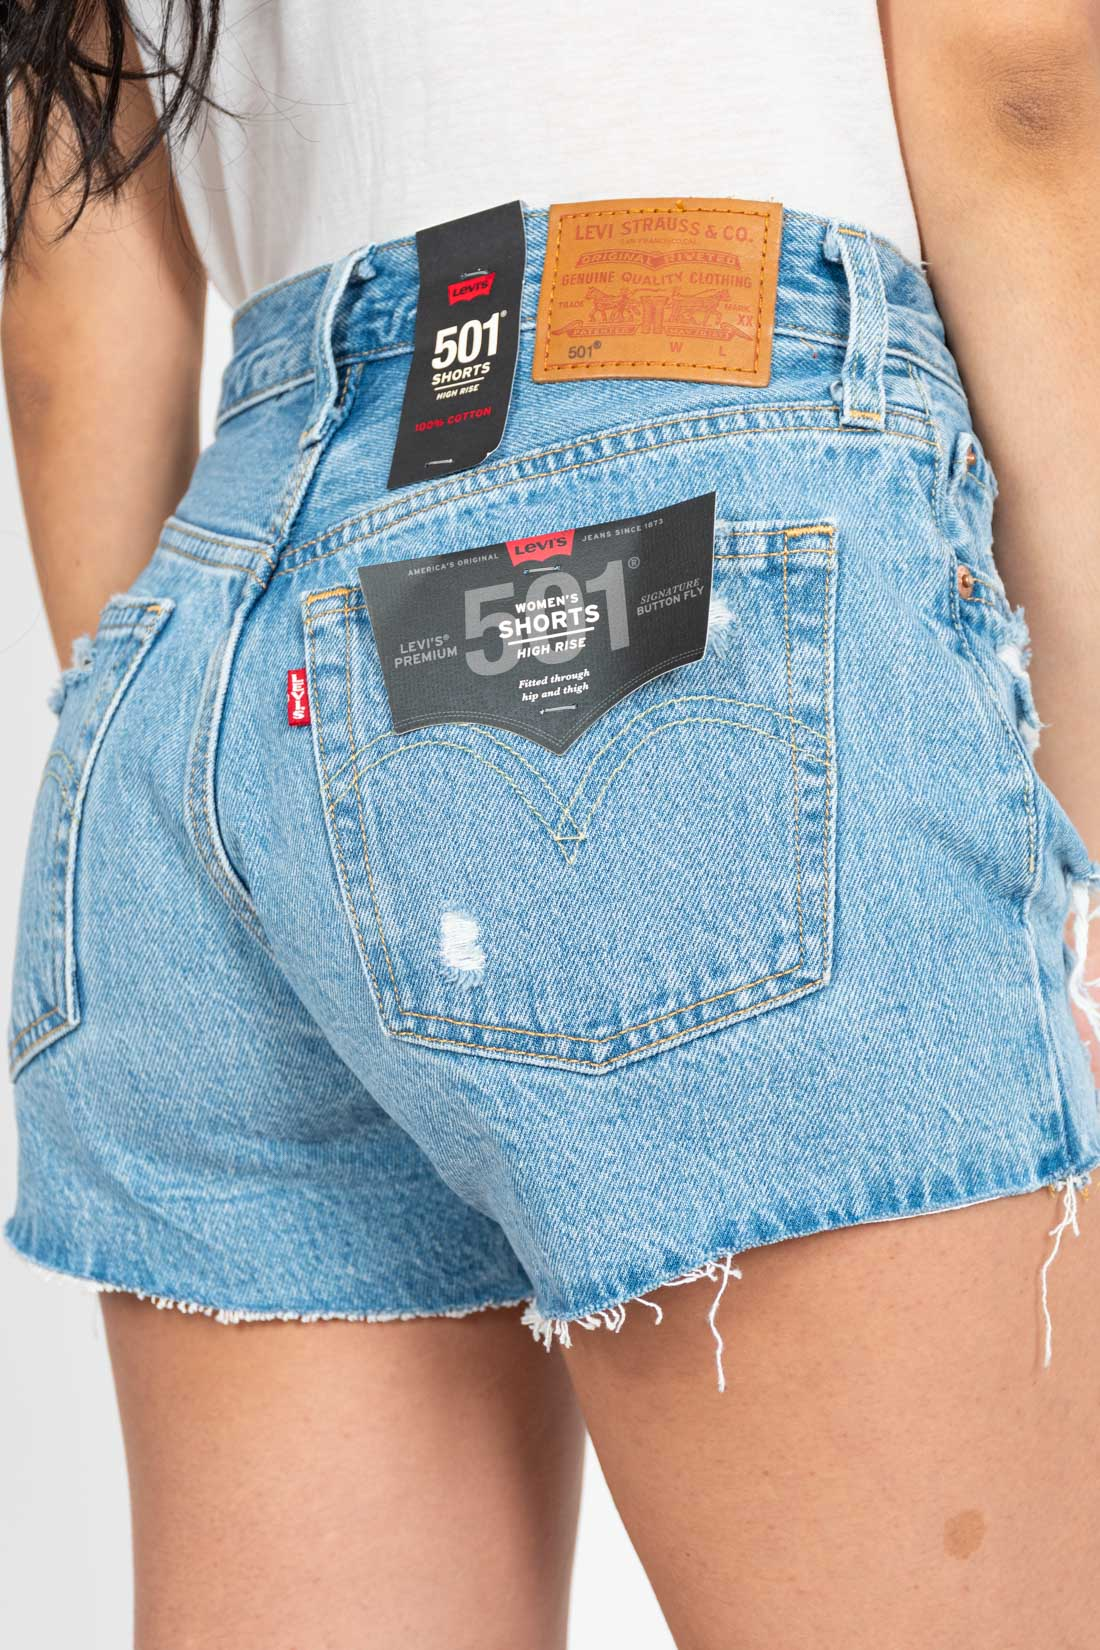 Shorts Jeans Levis Destroyed